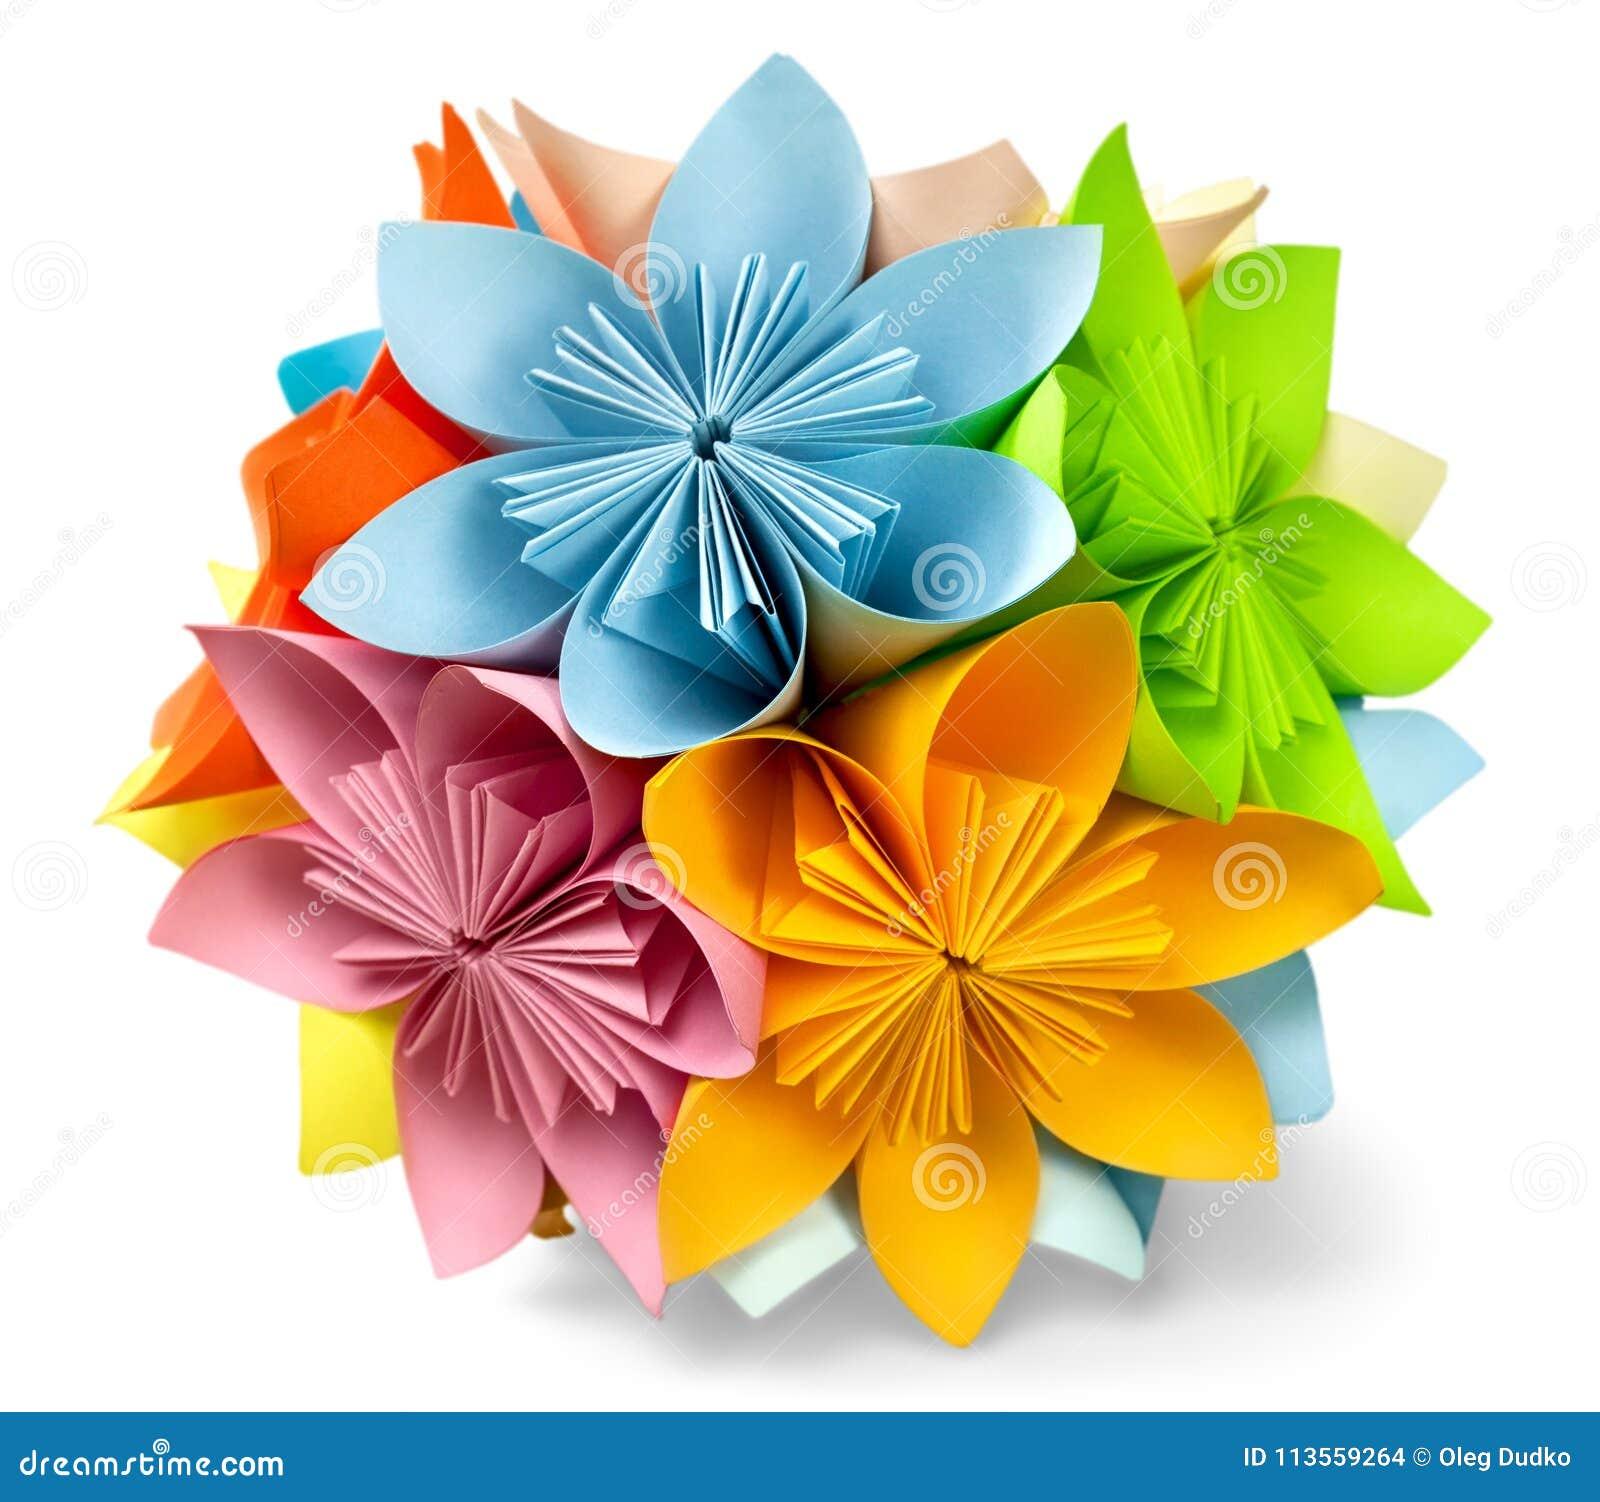 Colorful Flower Origami Isolated Image Stock Photo Image Of